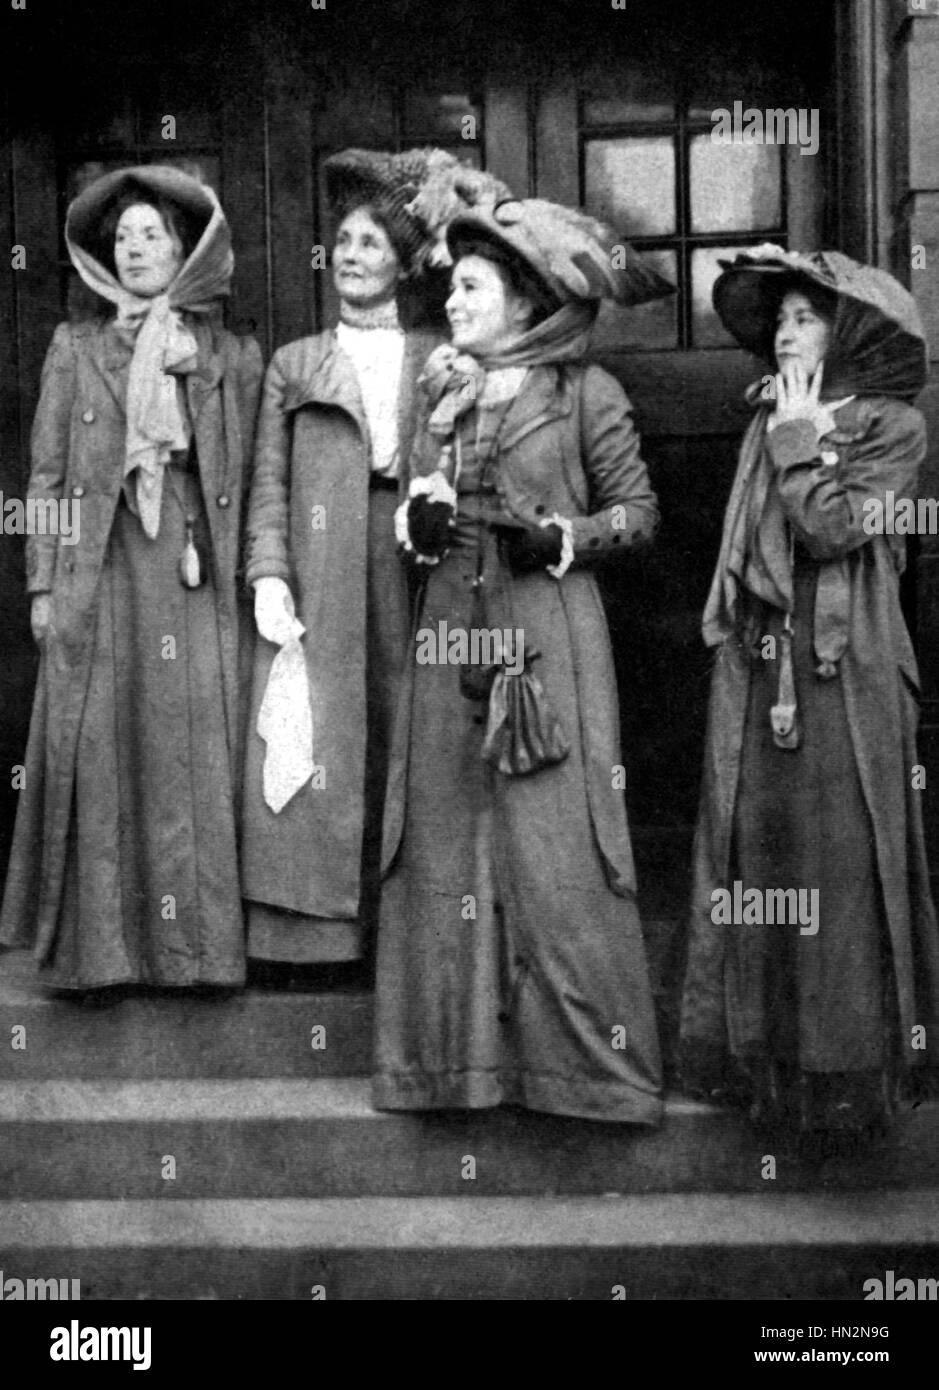 Main leaders of the sufragettes. From left to right: Christabel Pankhurst, Mrs Pankhurst, Pethick Lawrence, Adela Pankhurst. Beginning of 20th century Stock Photo